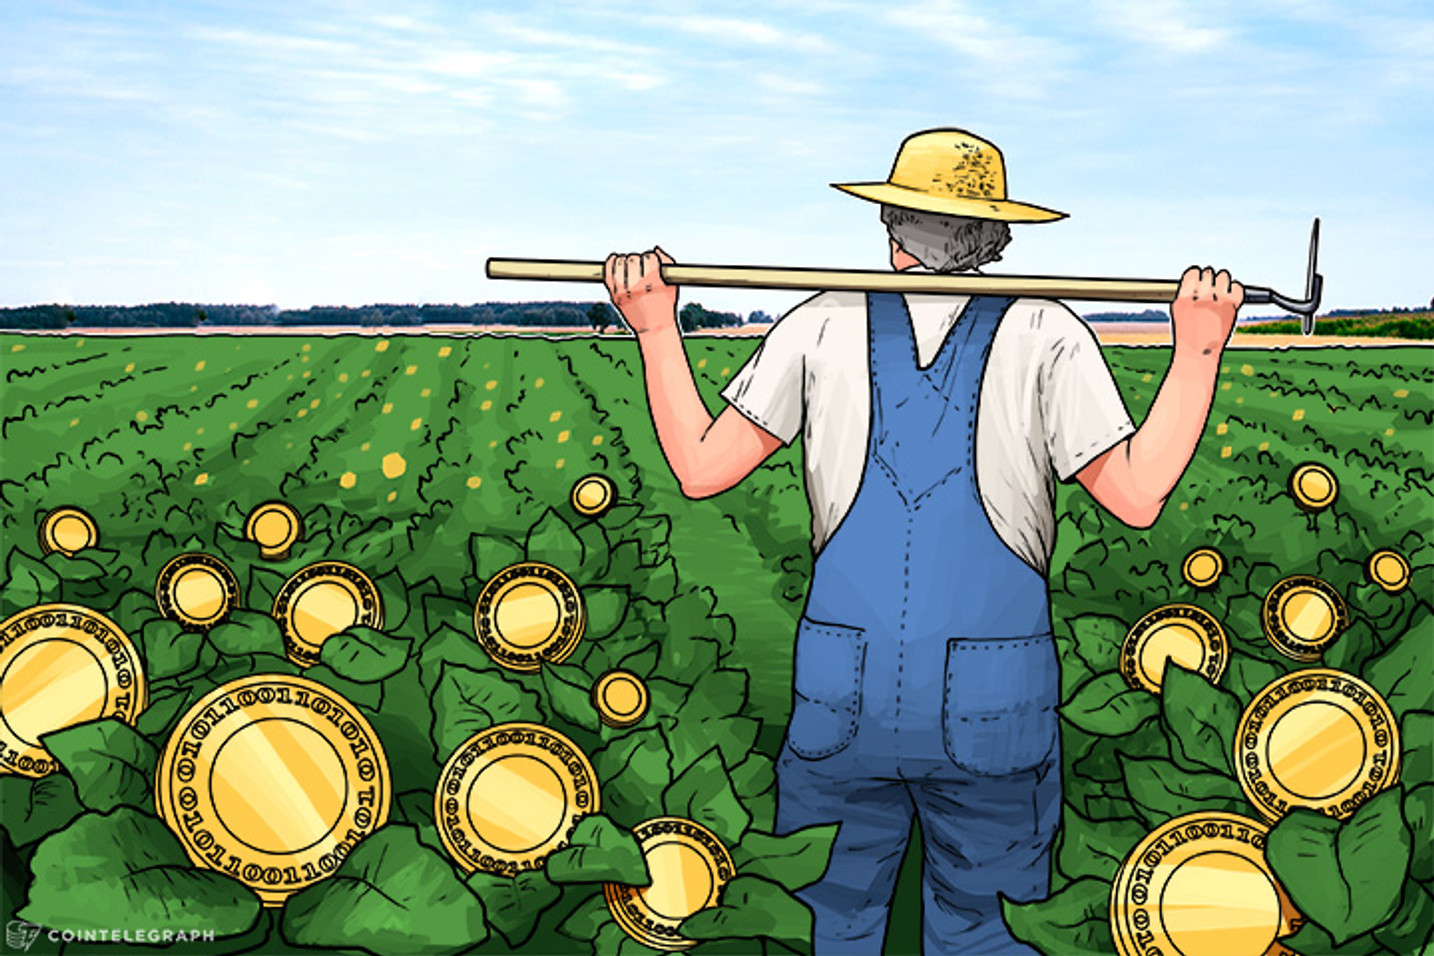 Crypto Market Maturing, Not Stalling